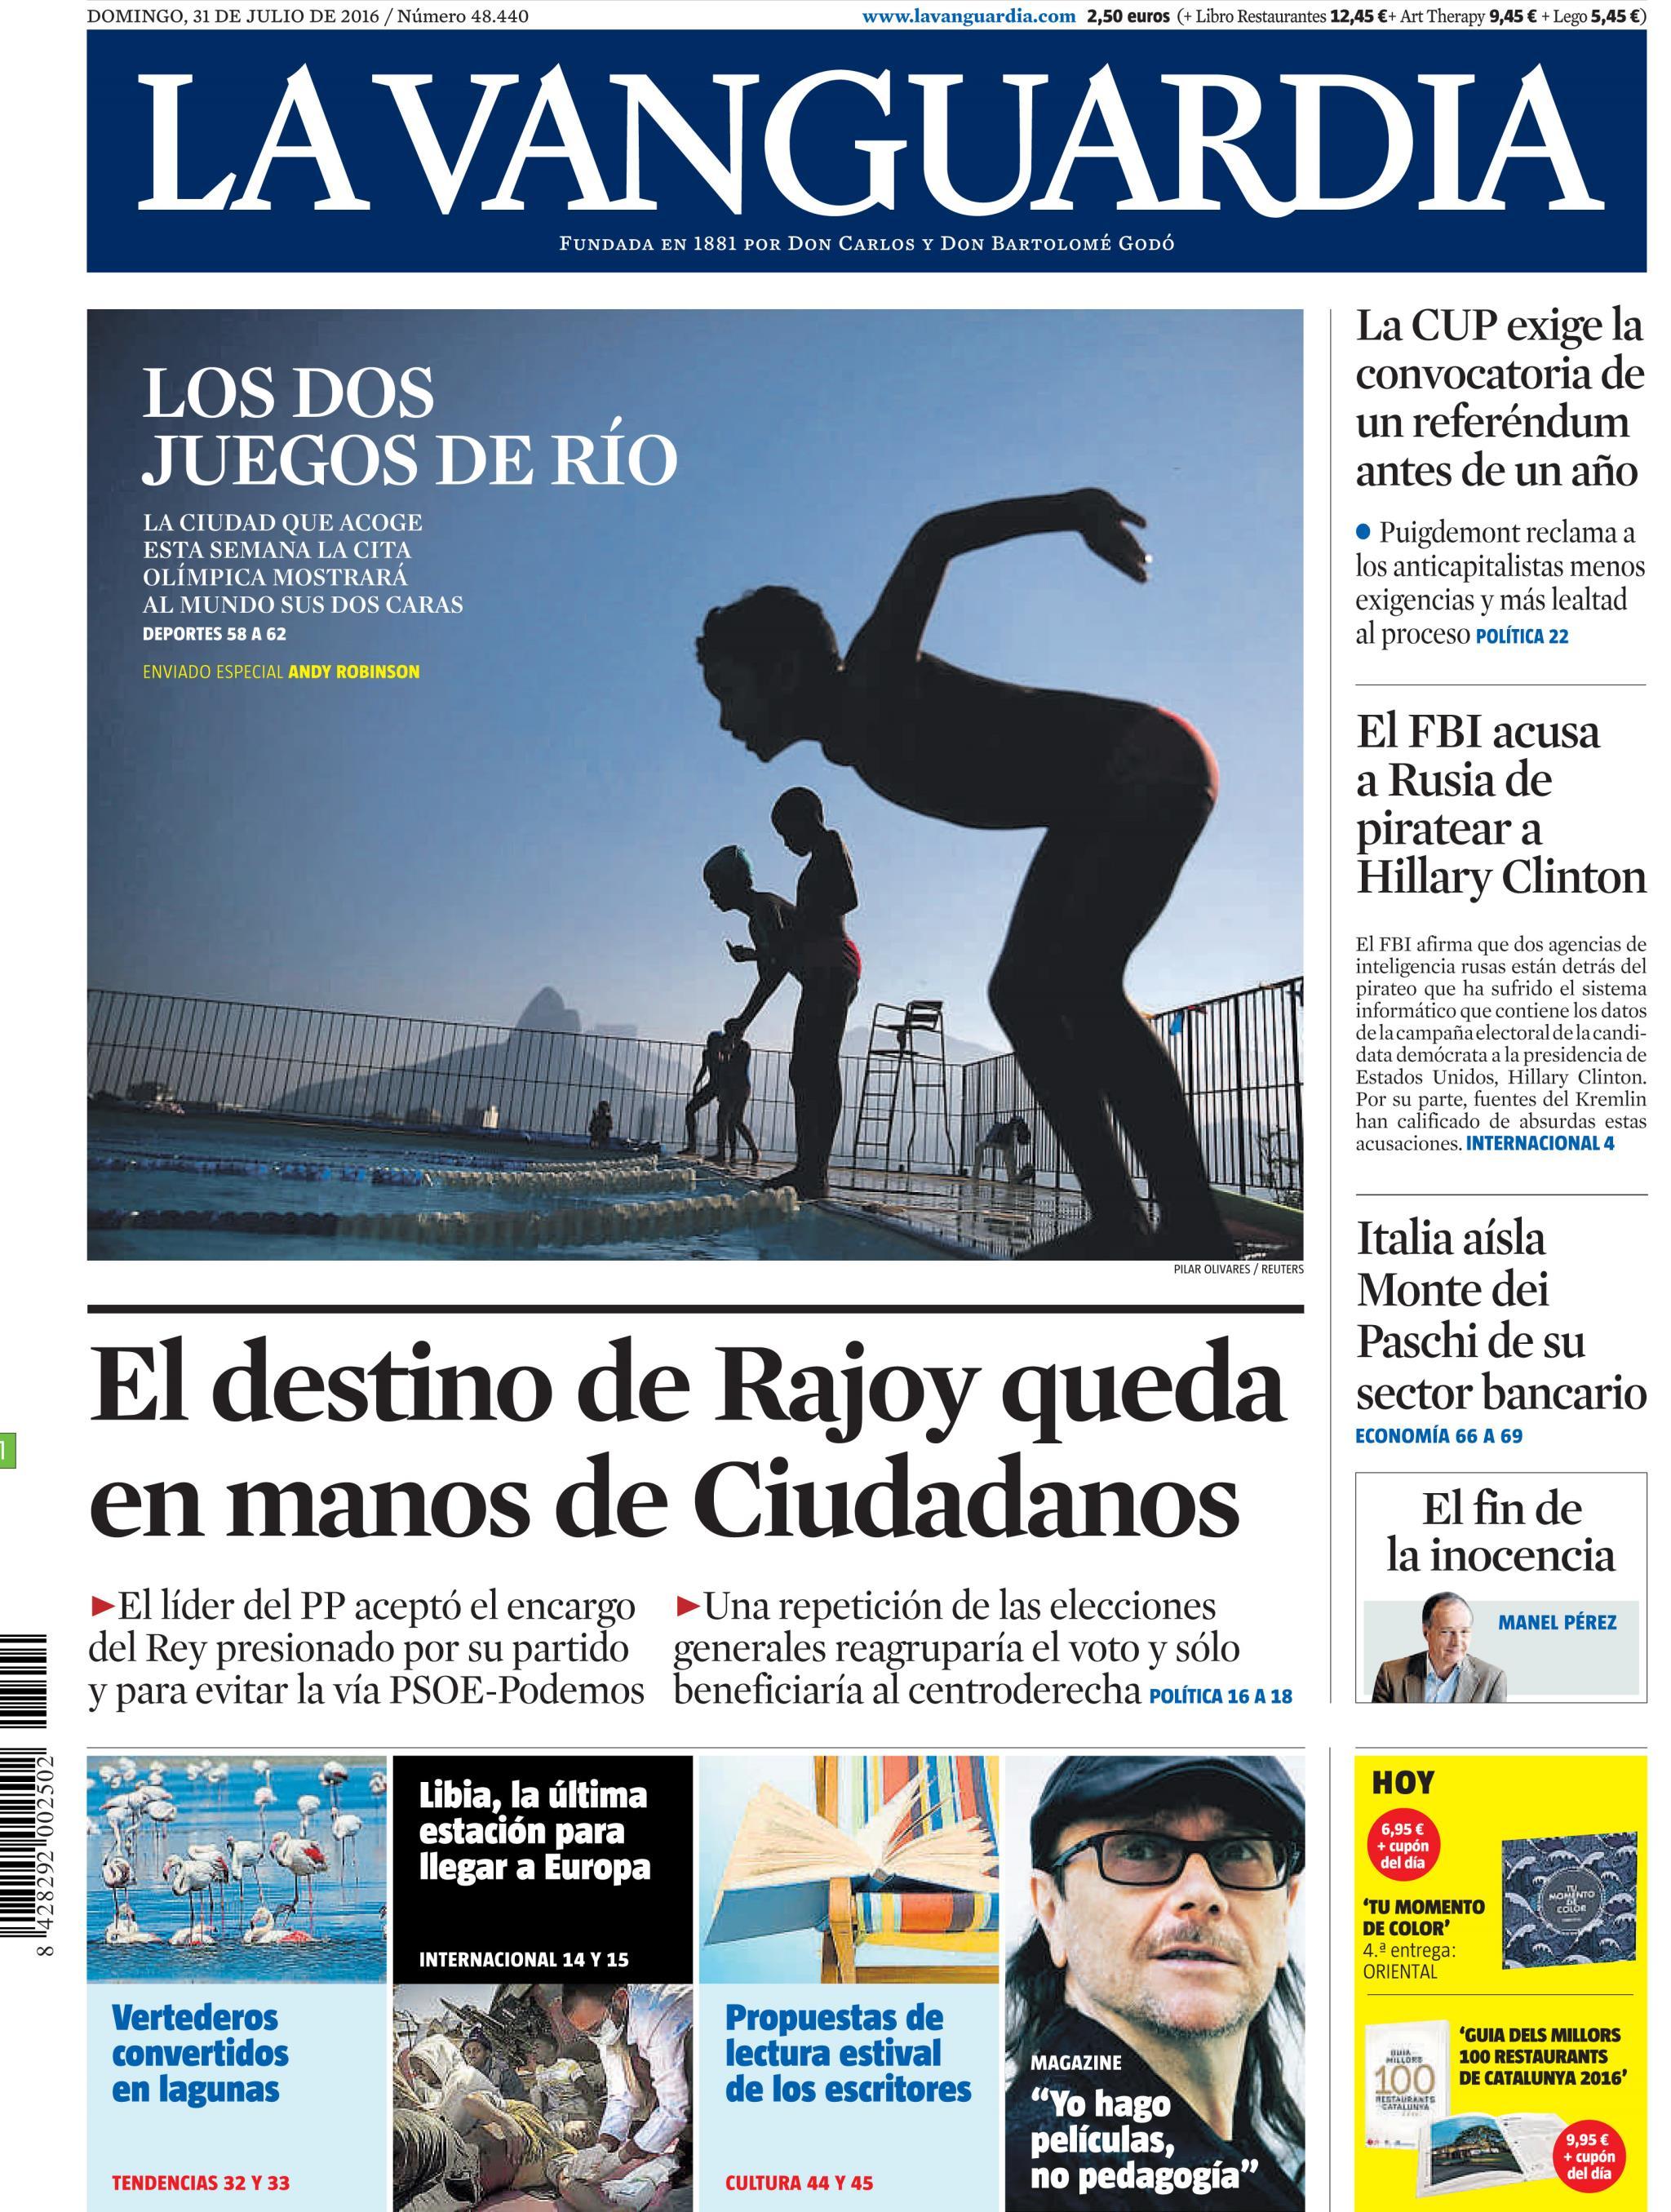 Vanguardia portada 31 julio de 2016